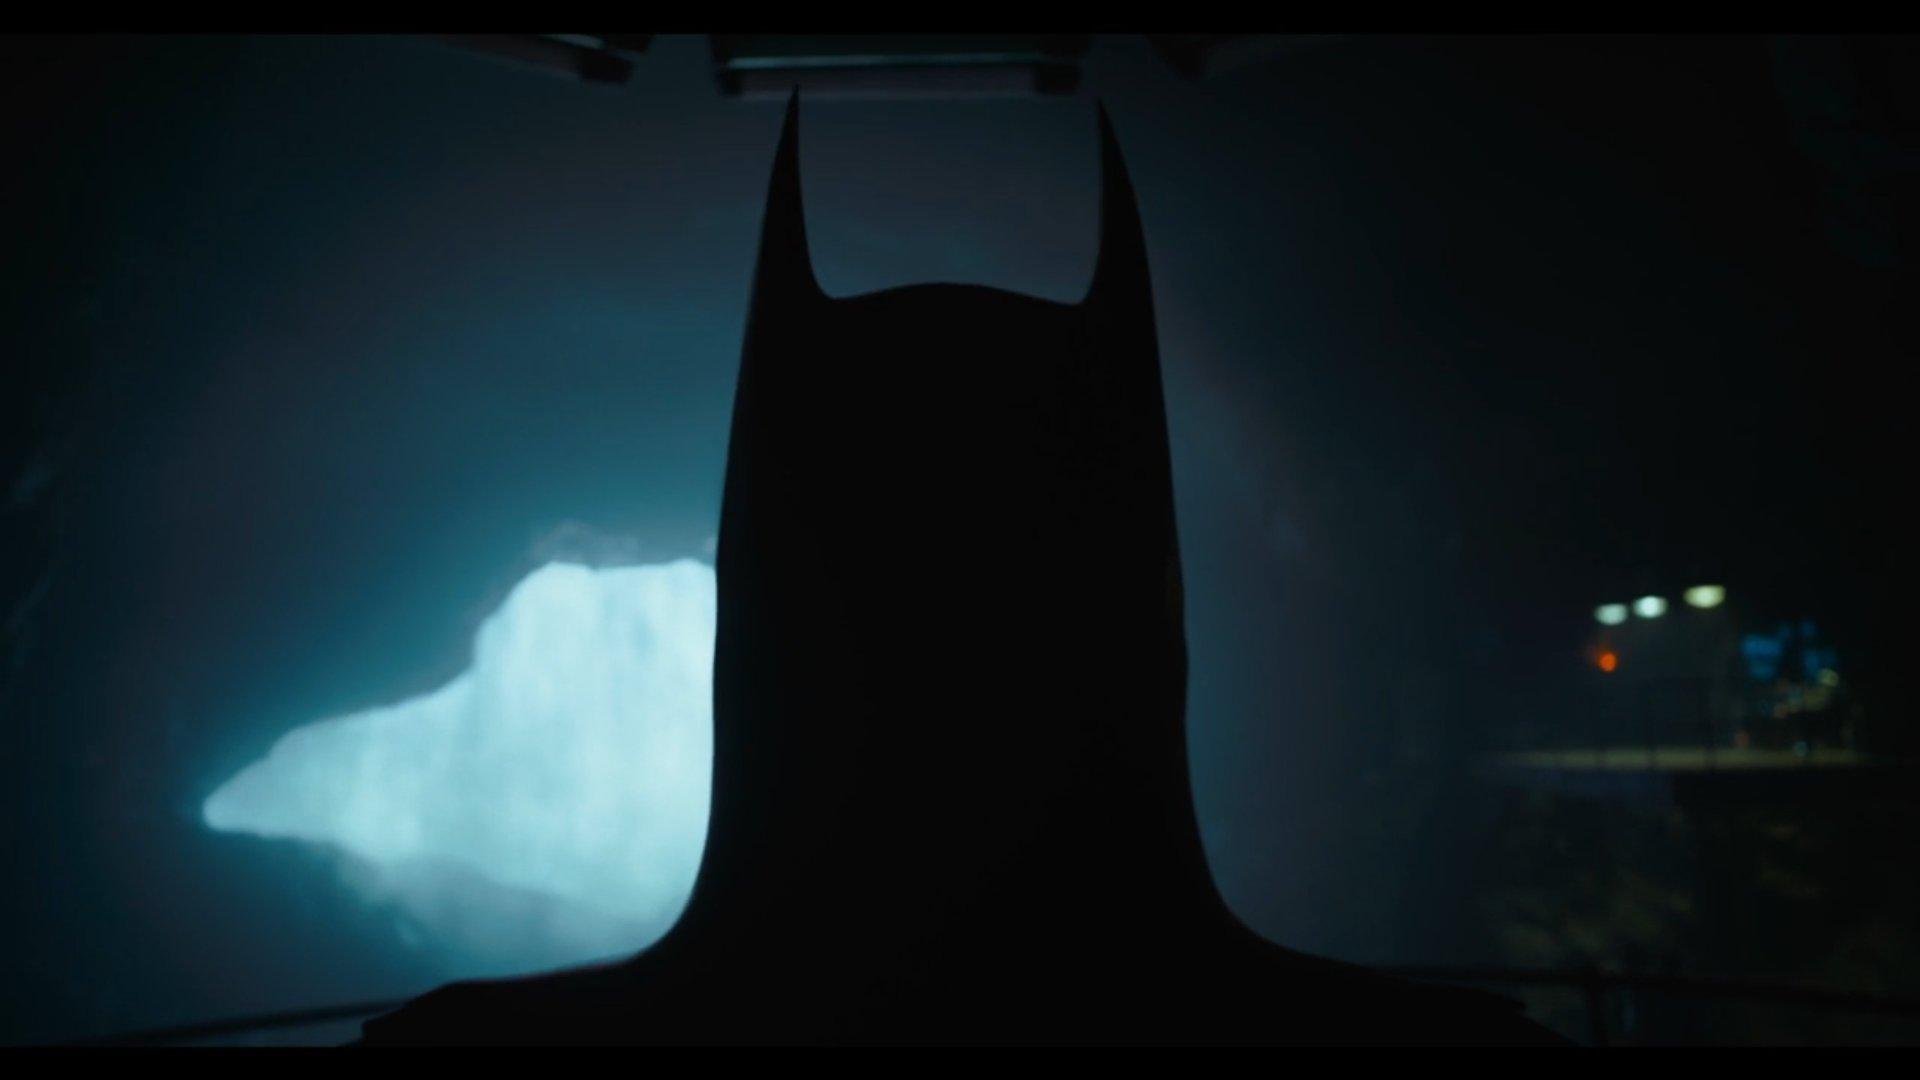 TRAILER: A first look at Michael Keaton as Batman in The Flash